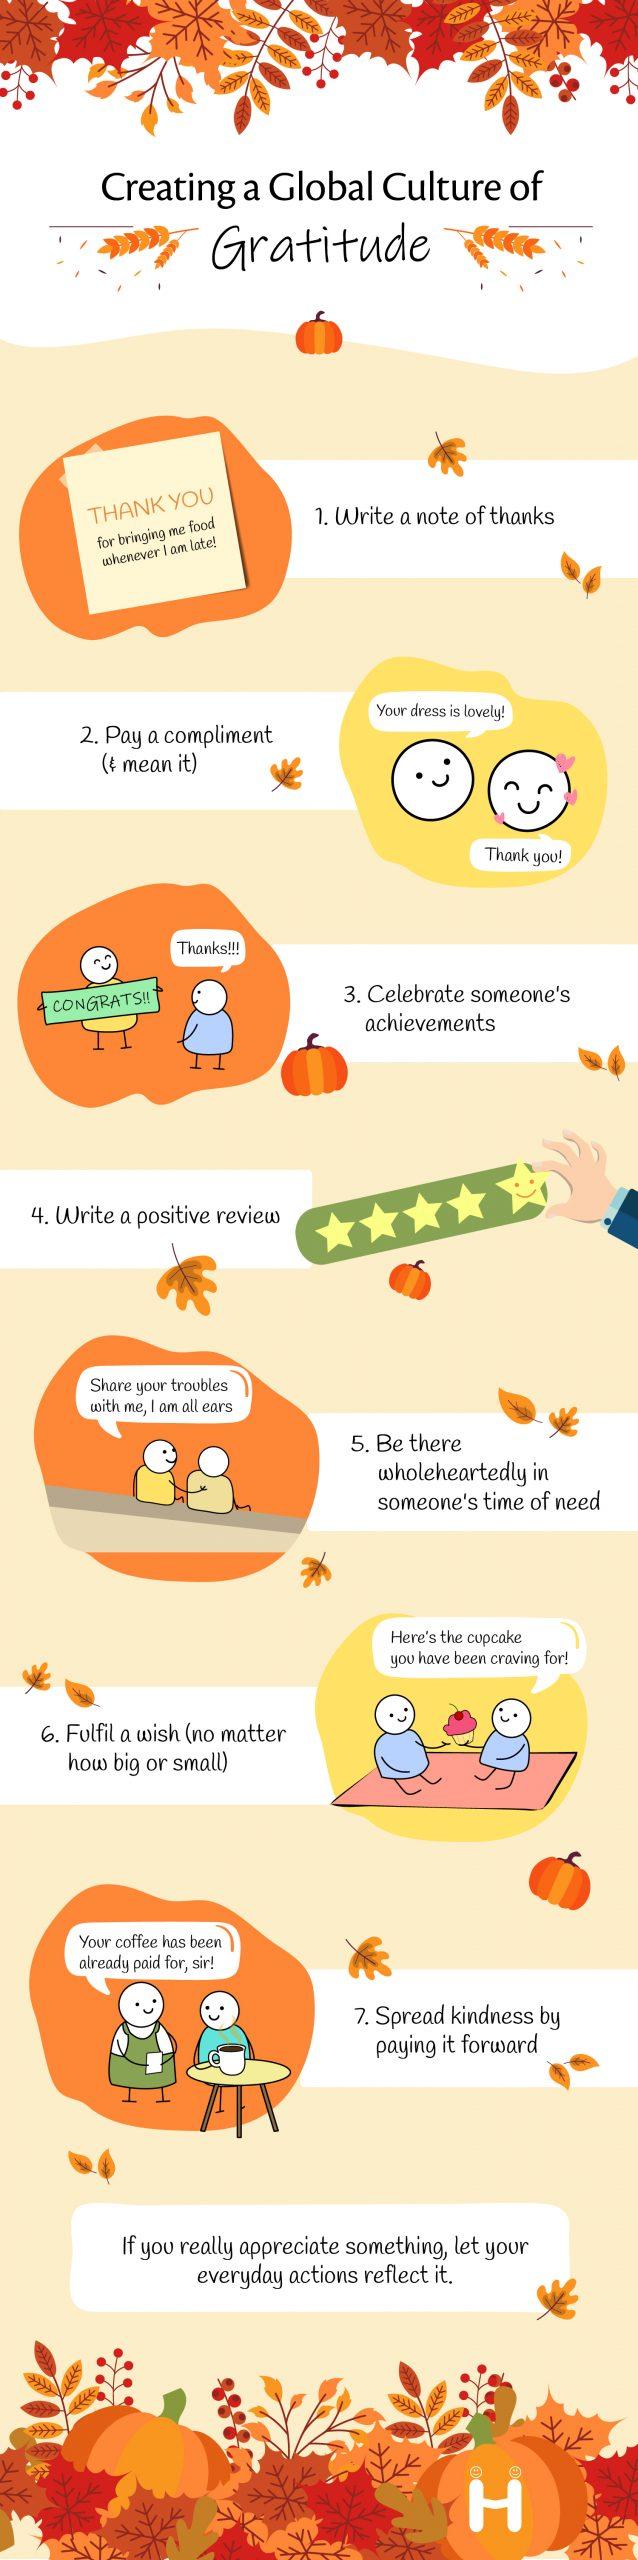 Ways to express gratitude infographic